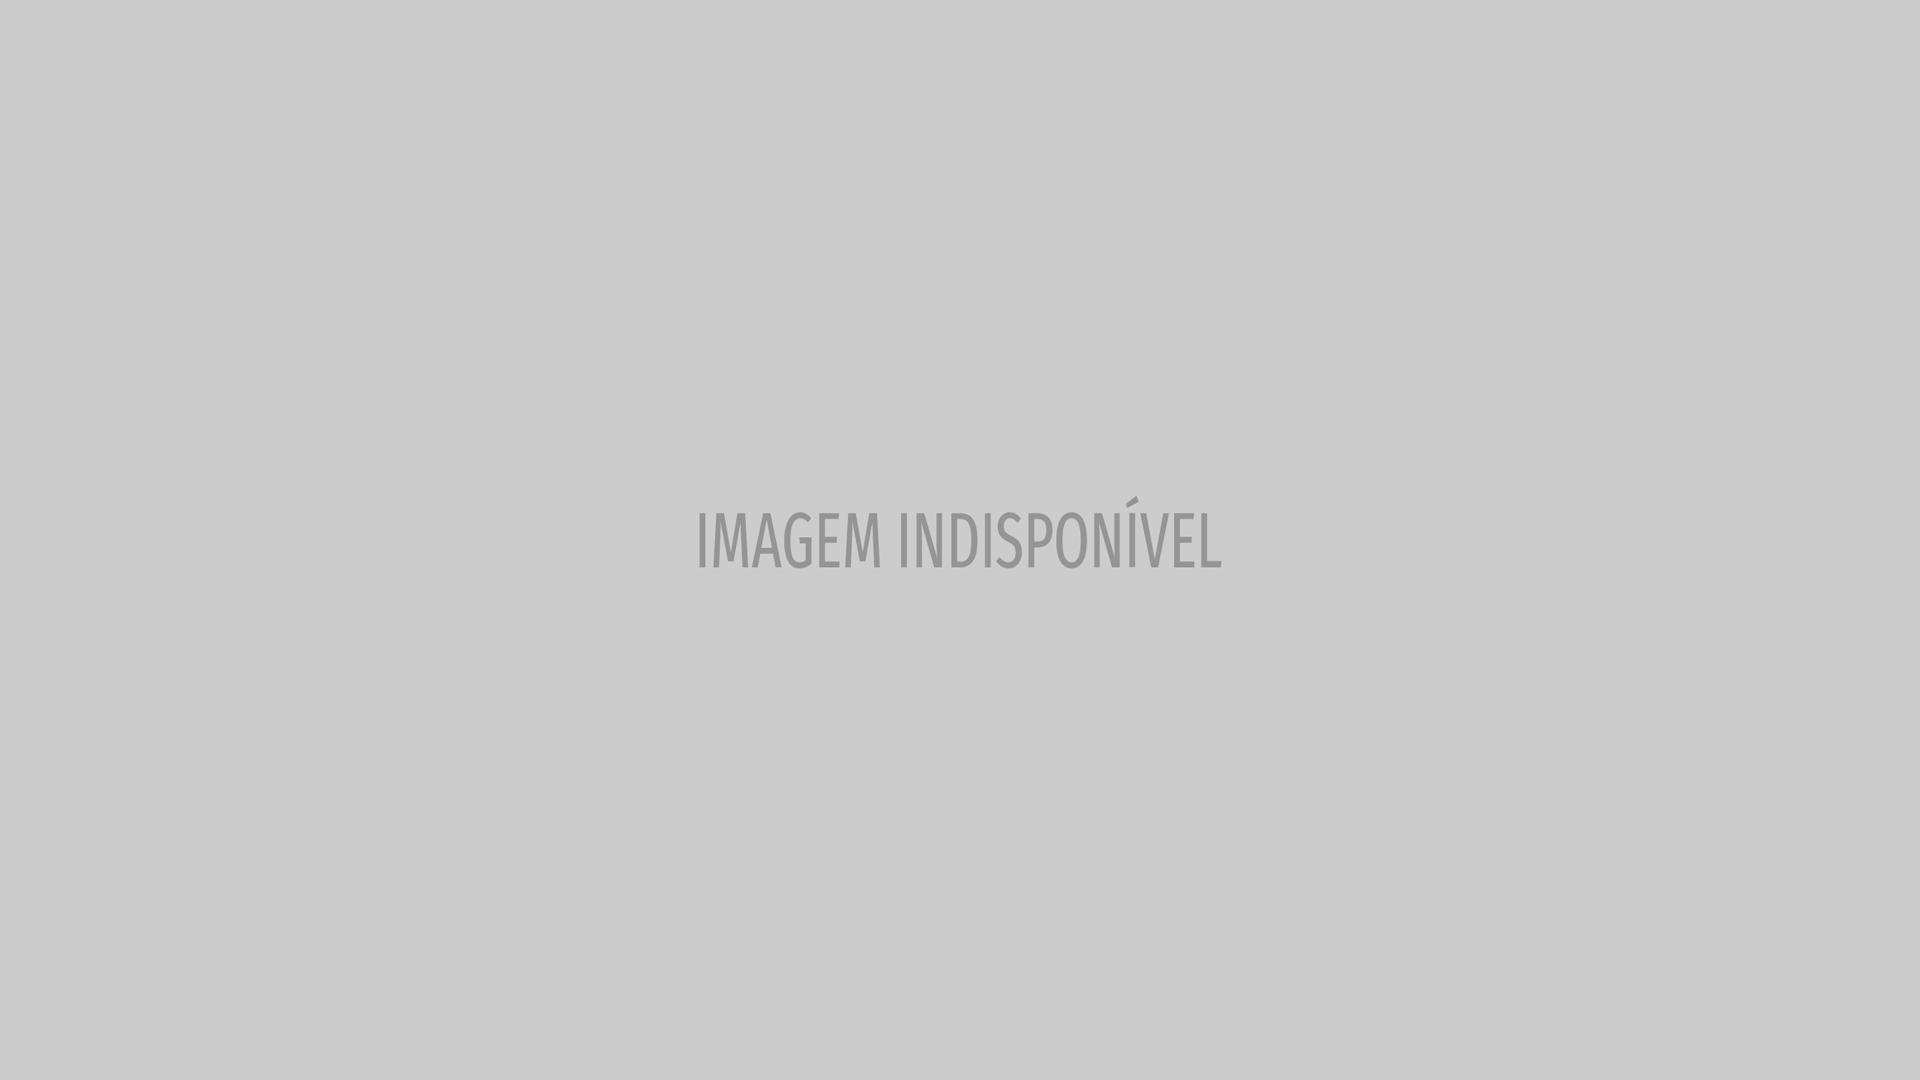 5111ad37a Kourtney Kardashian posa com biquíni assinado por Emily Ratajkowski